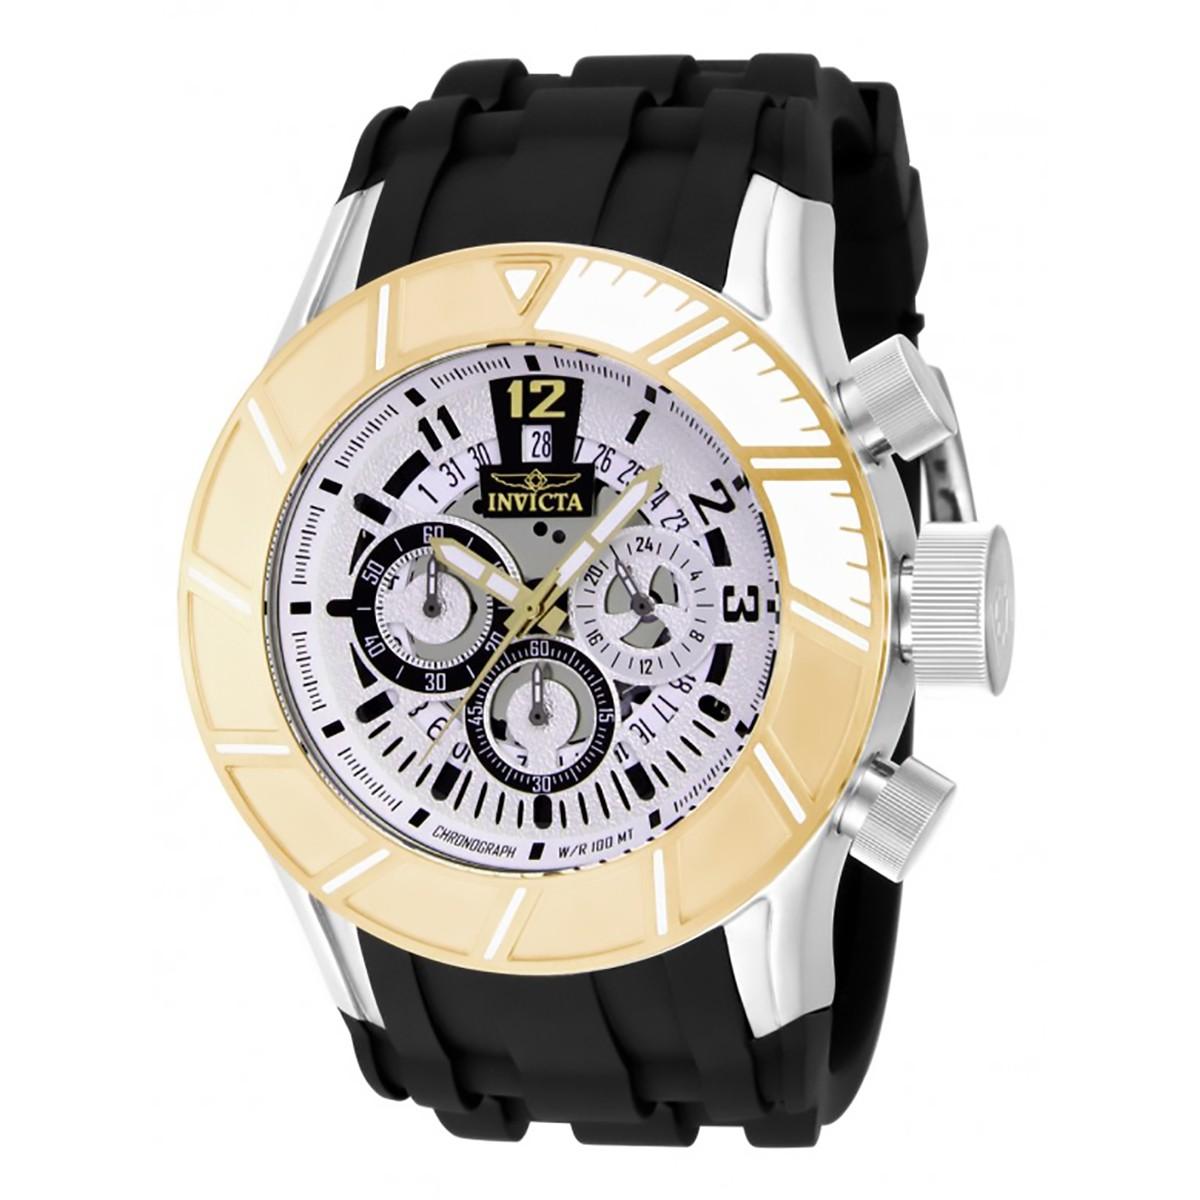 e1c816c3184 Compre Relógio Invicta Pro Diver em 10X